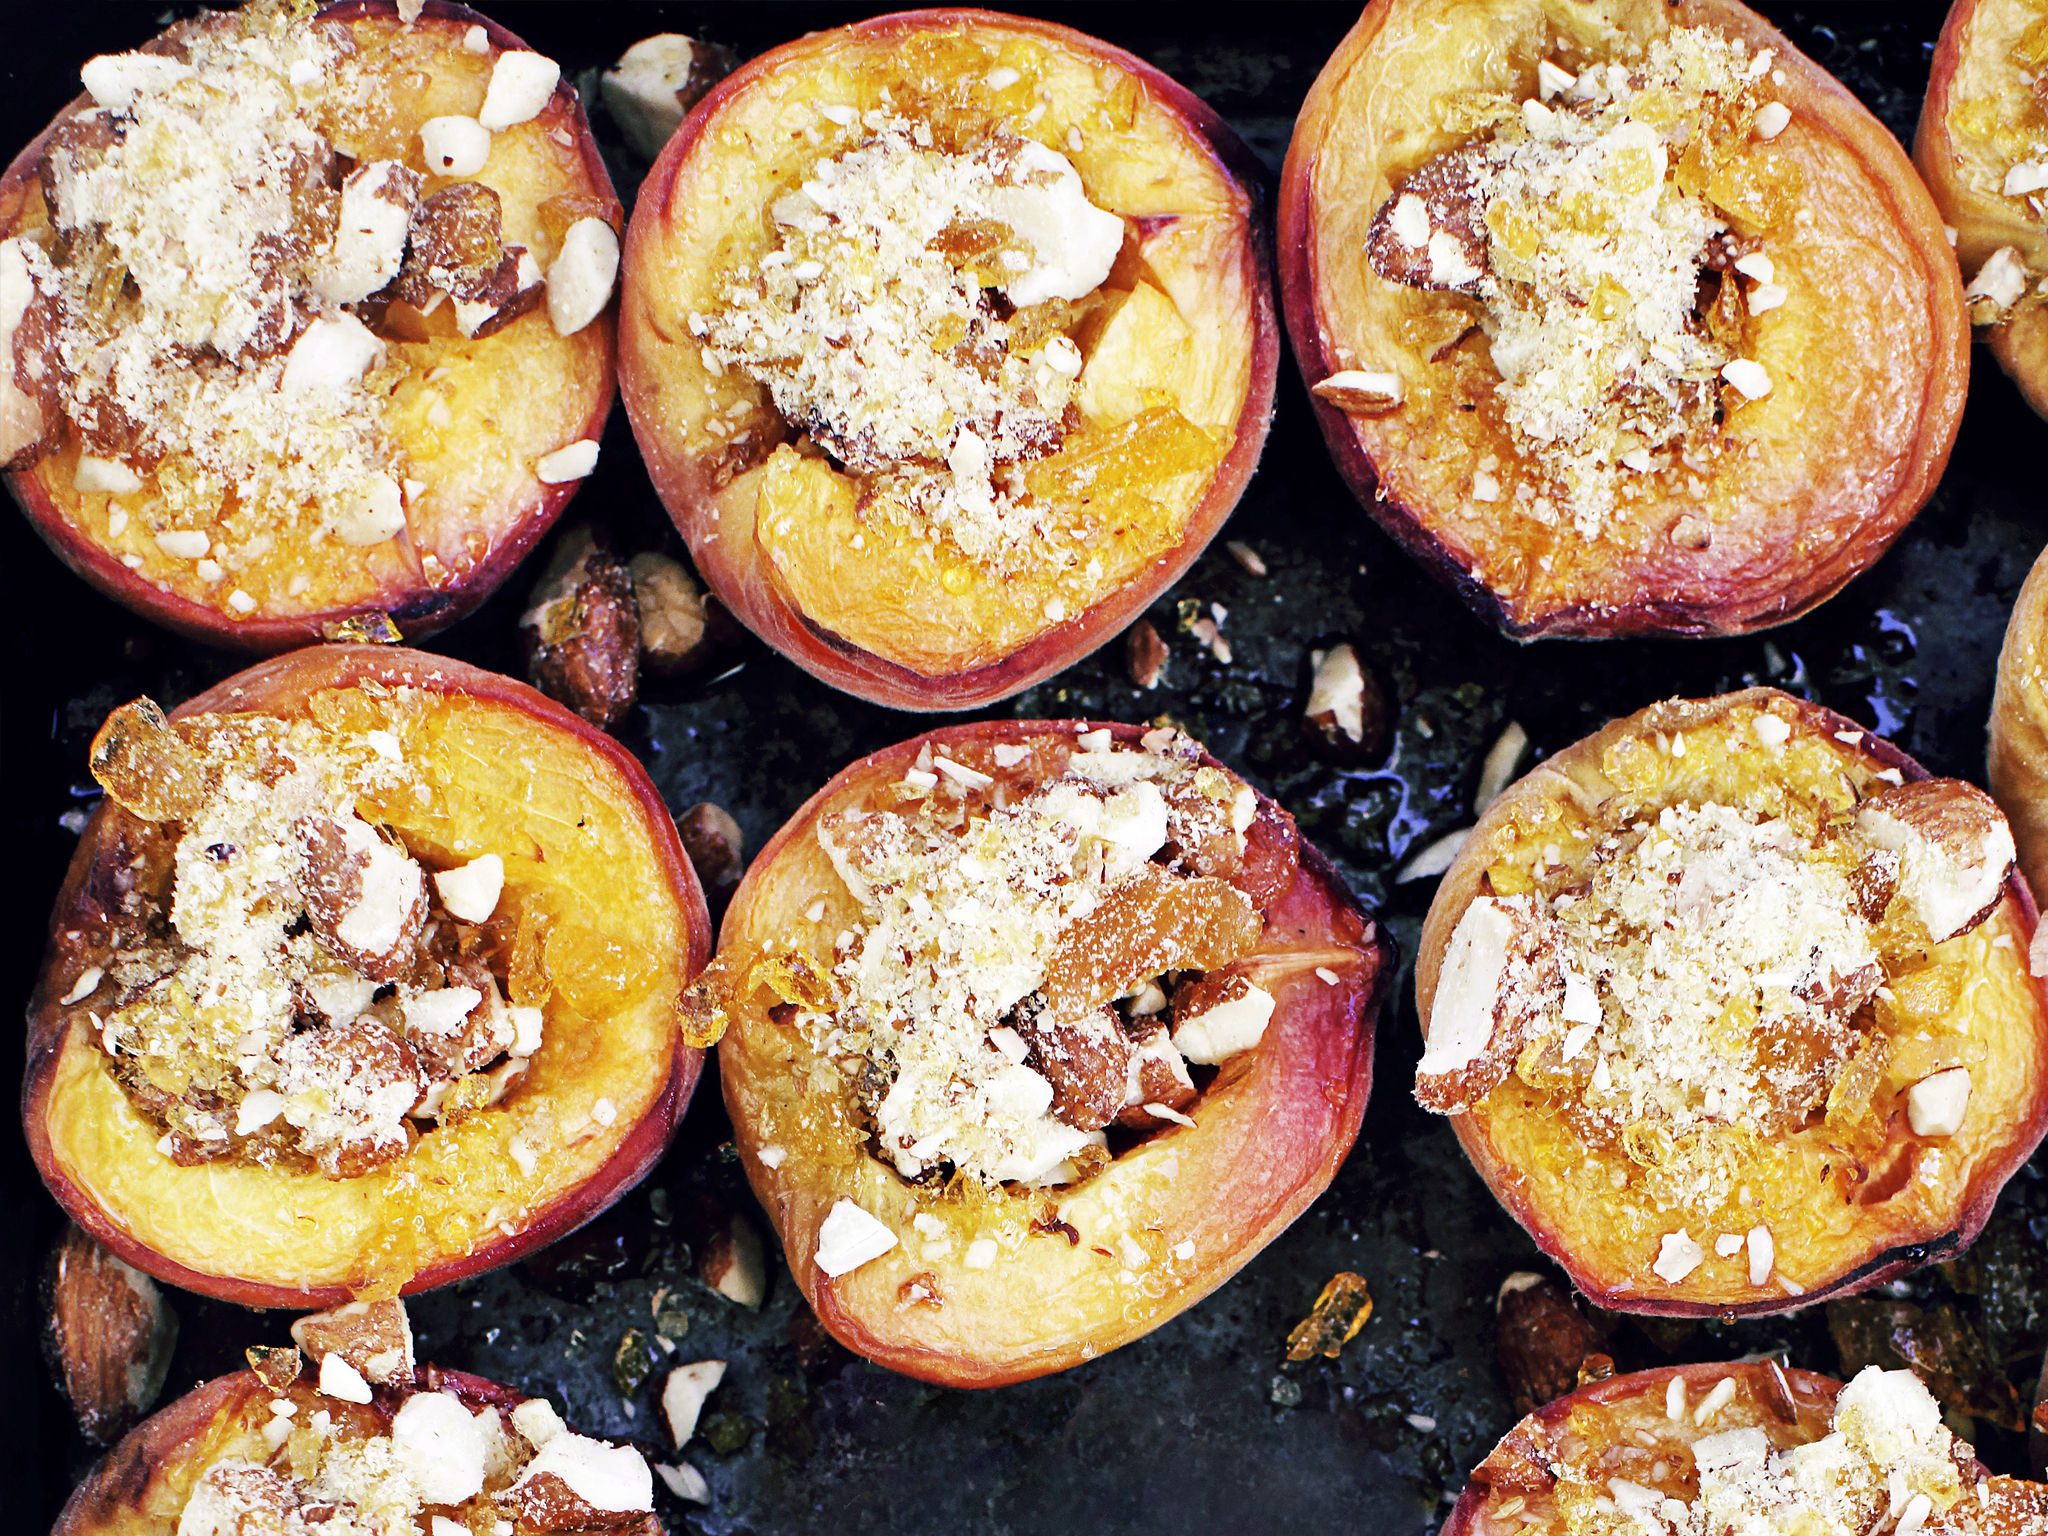 Baked Almond Peaches